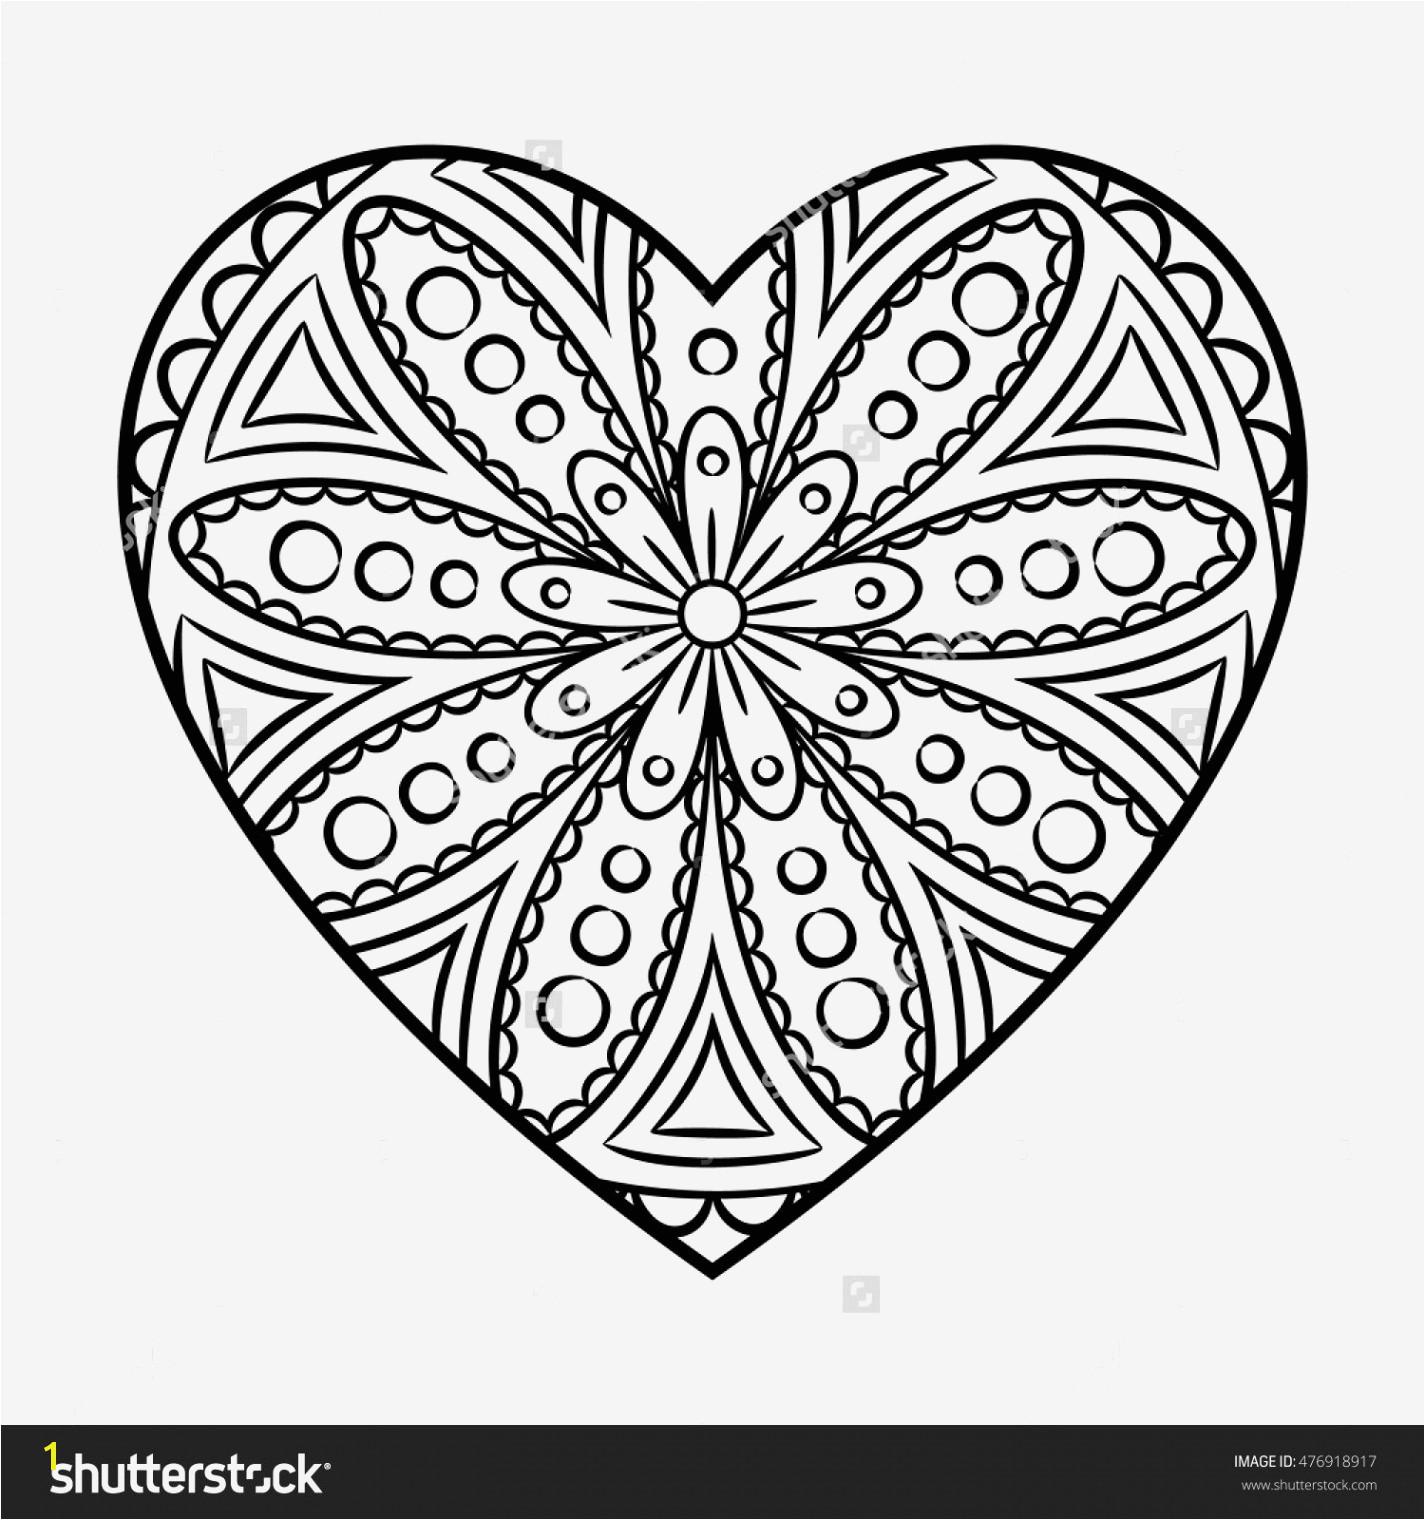 Printable Heart Mandala Coloring Pages Heart Mandala Coloring Pages Flower Outline Coloring Page Coloring Pages with Flowers and Hearts